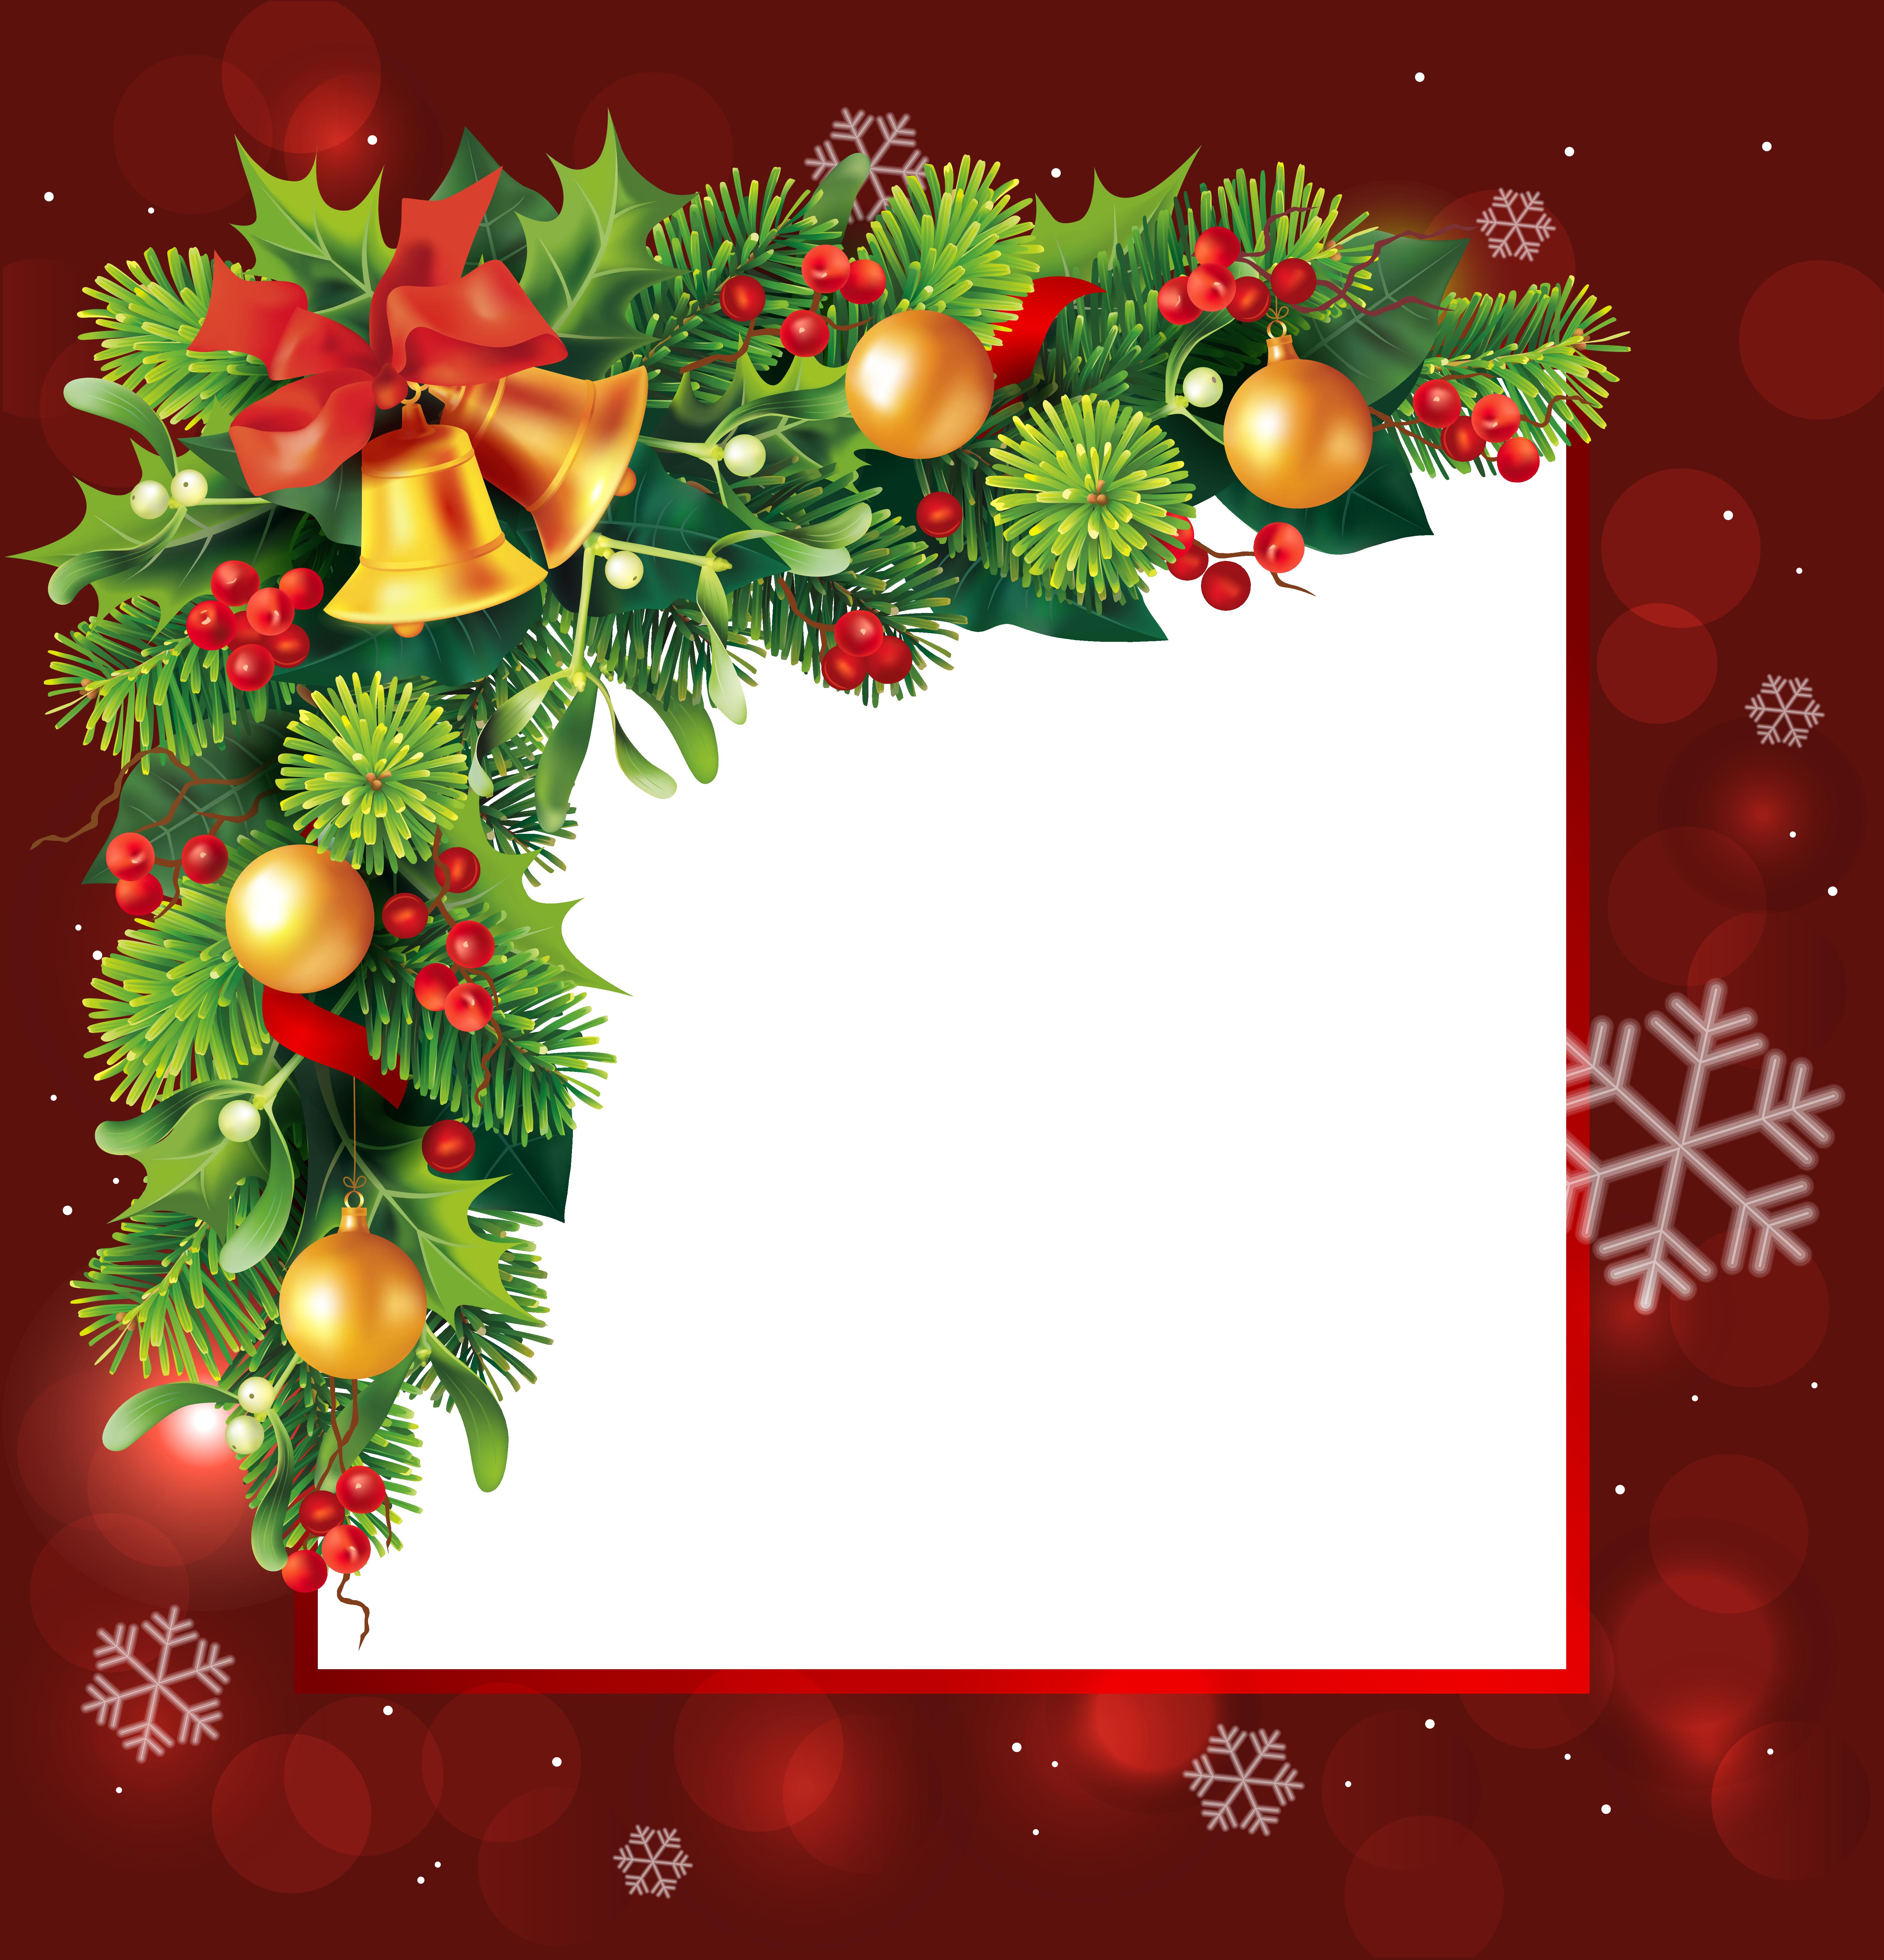 Red Christmas Transparent PNG Border Frame | Christmas ...